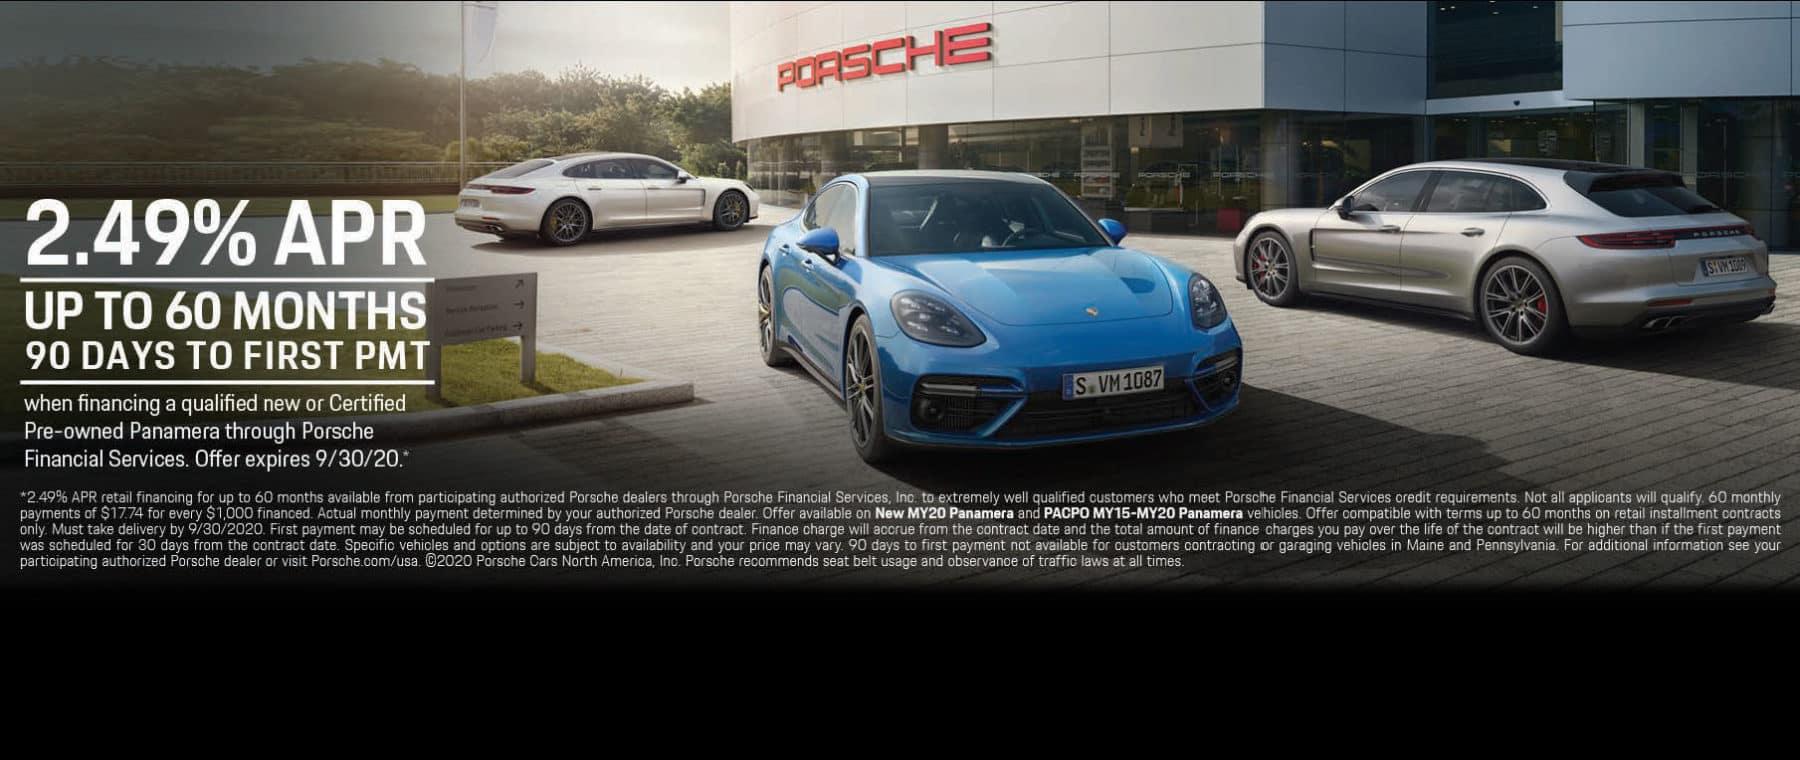 Porsche-APR-update-July-2020